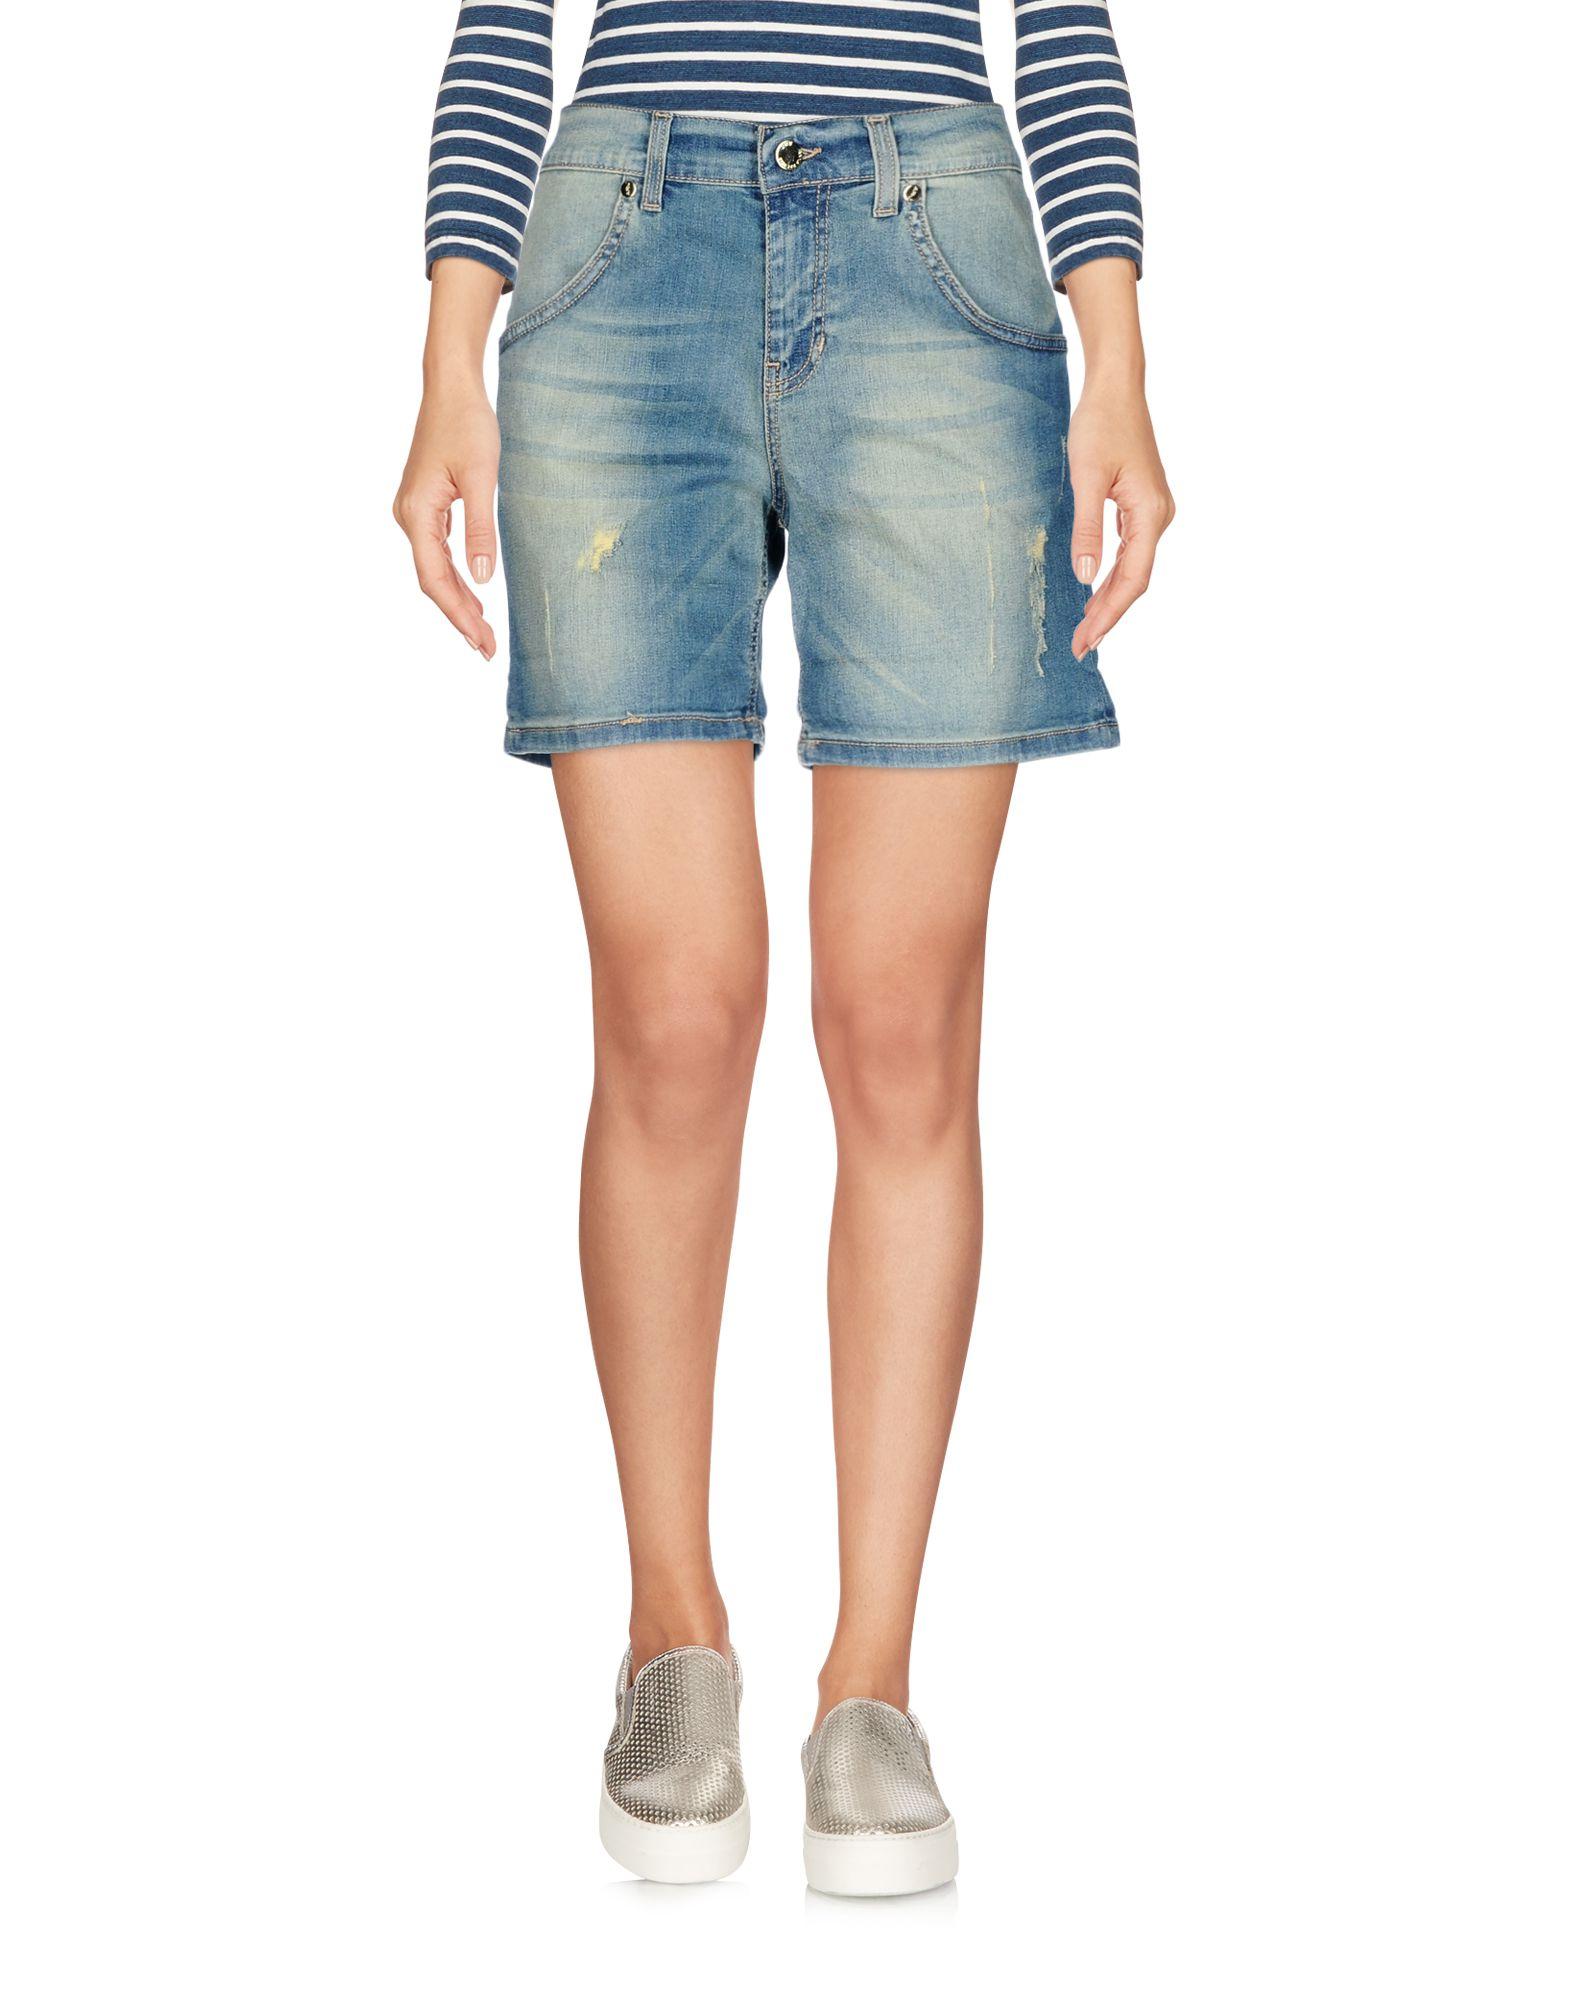 ANNA RACHELE JEANS COLLECTION Damen Jeansbermudashorts Farbe Blau Größe 3